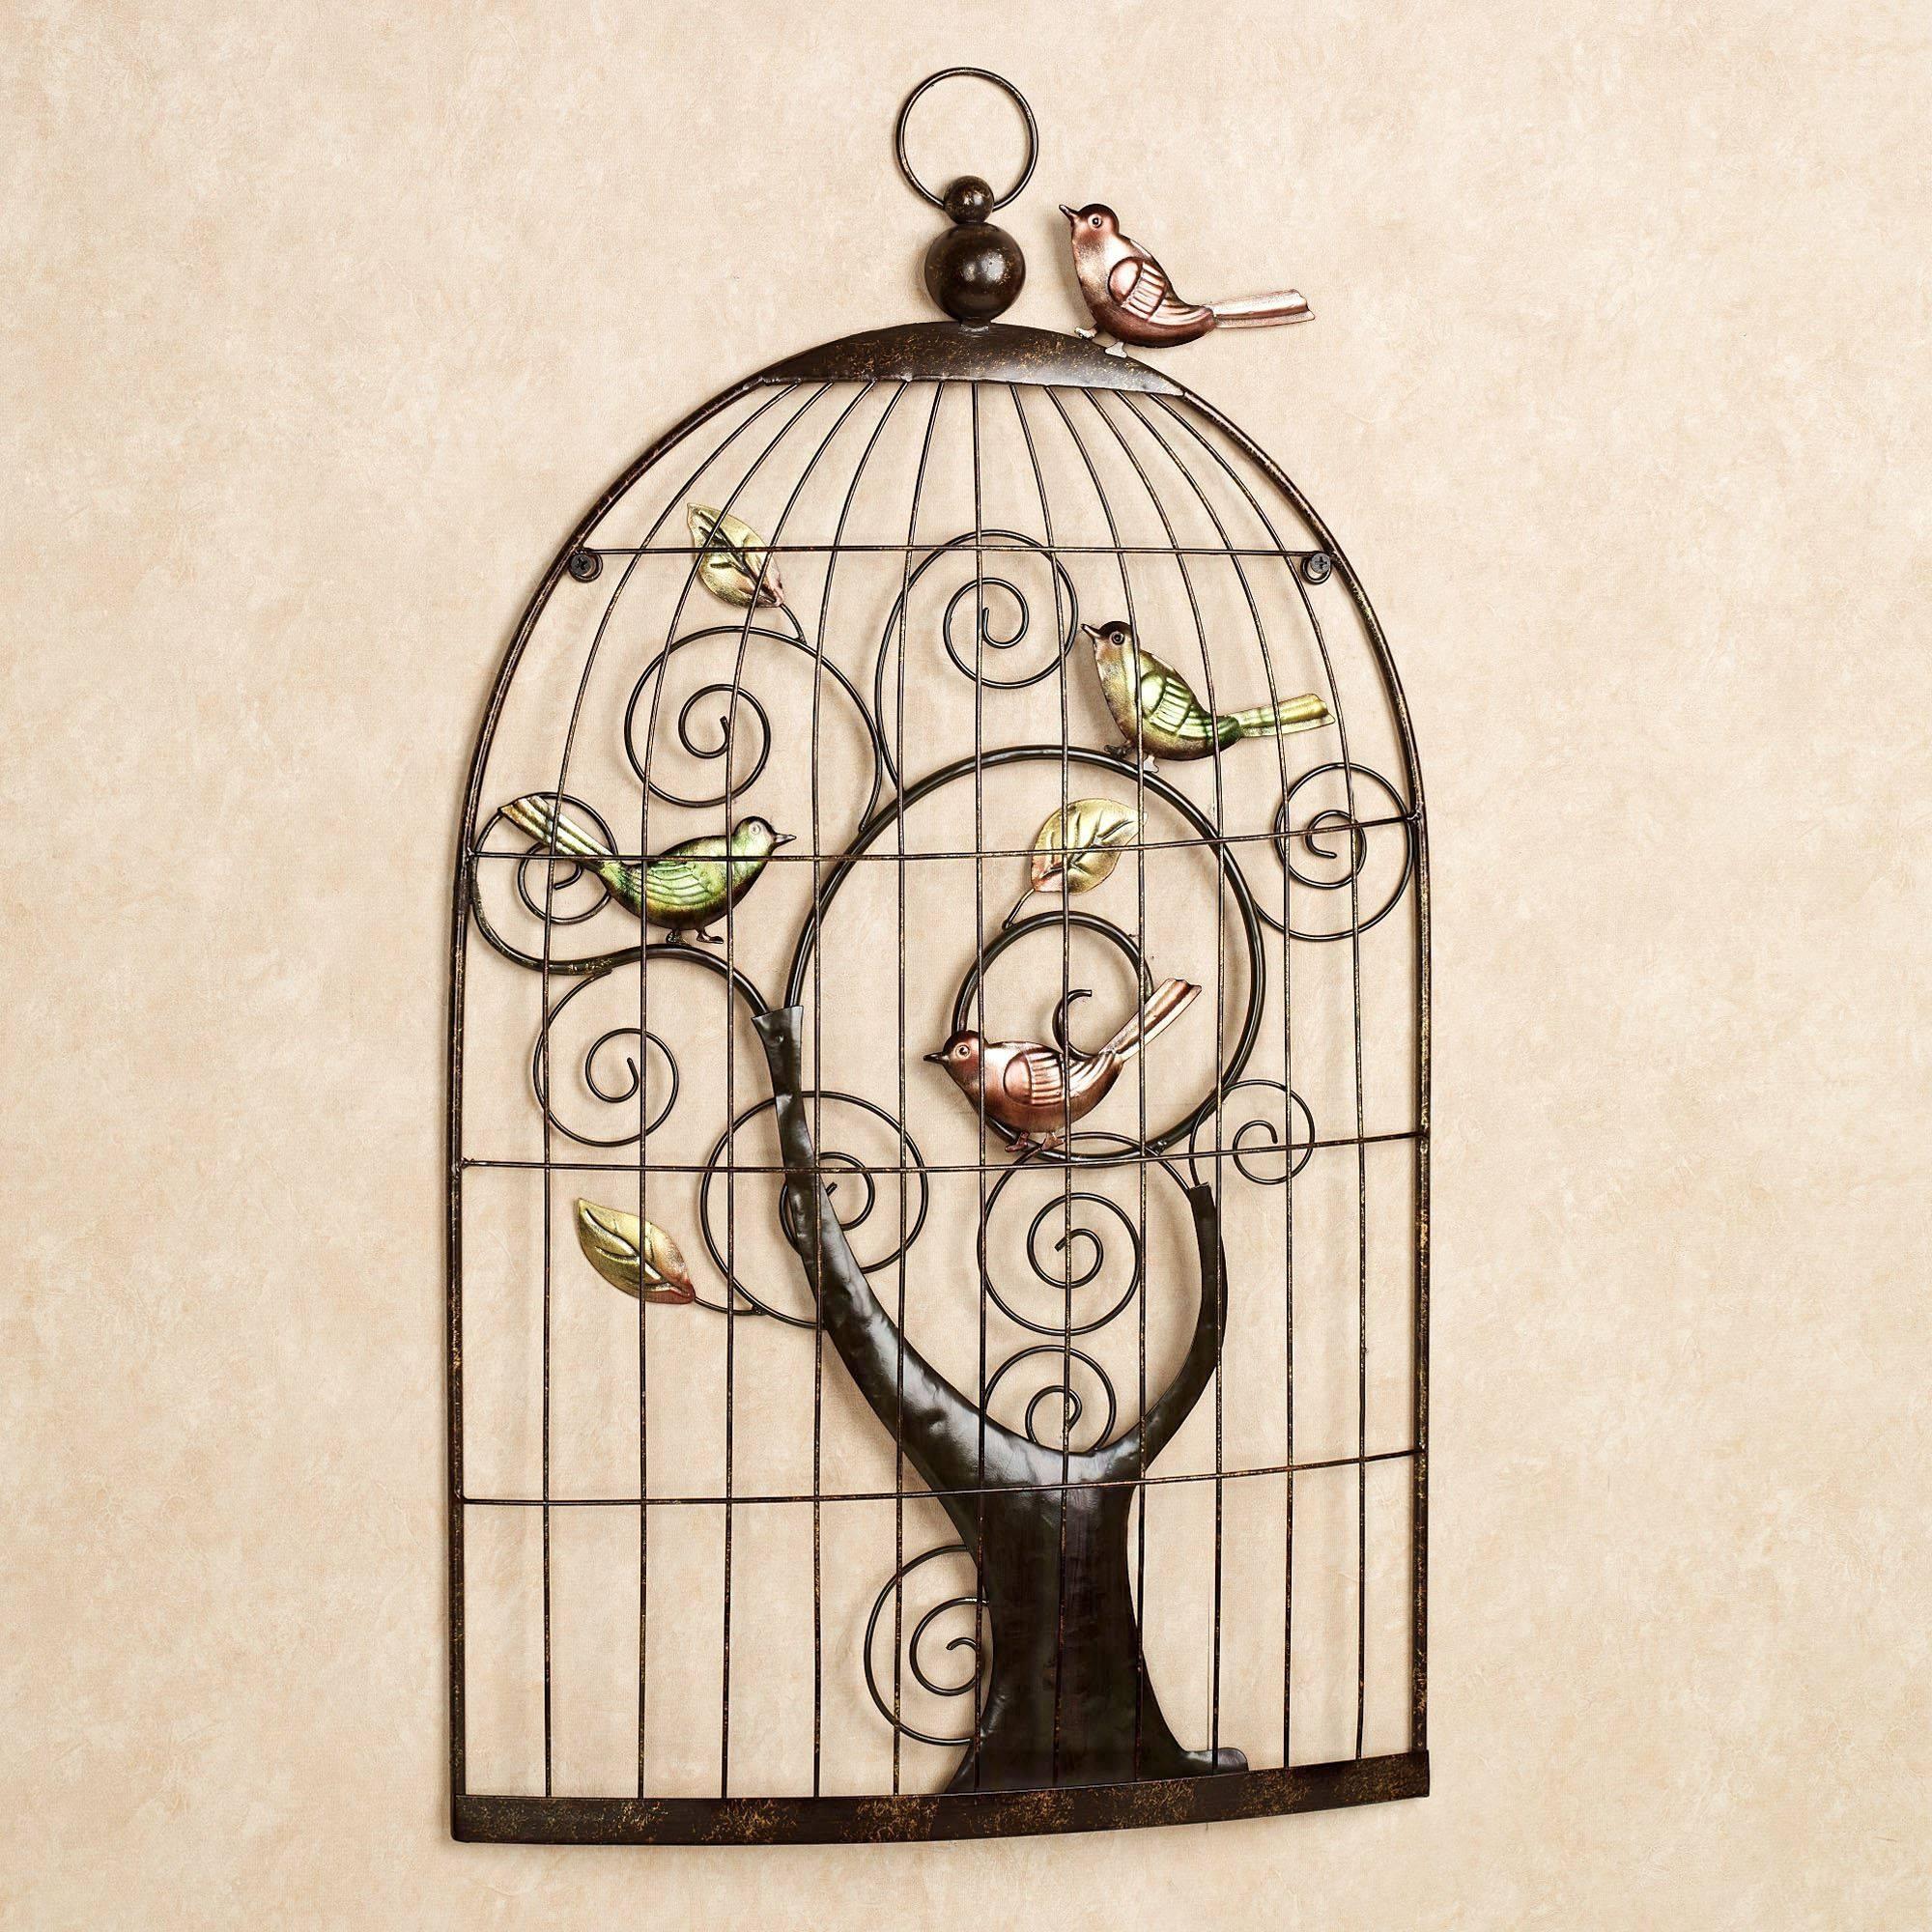 Enchanting Sonnet Birdcage Metal Wall Art In Most Recent Birdcage Metal Wall Art (View 5 of 20)